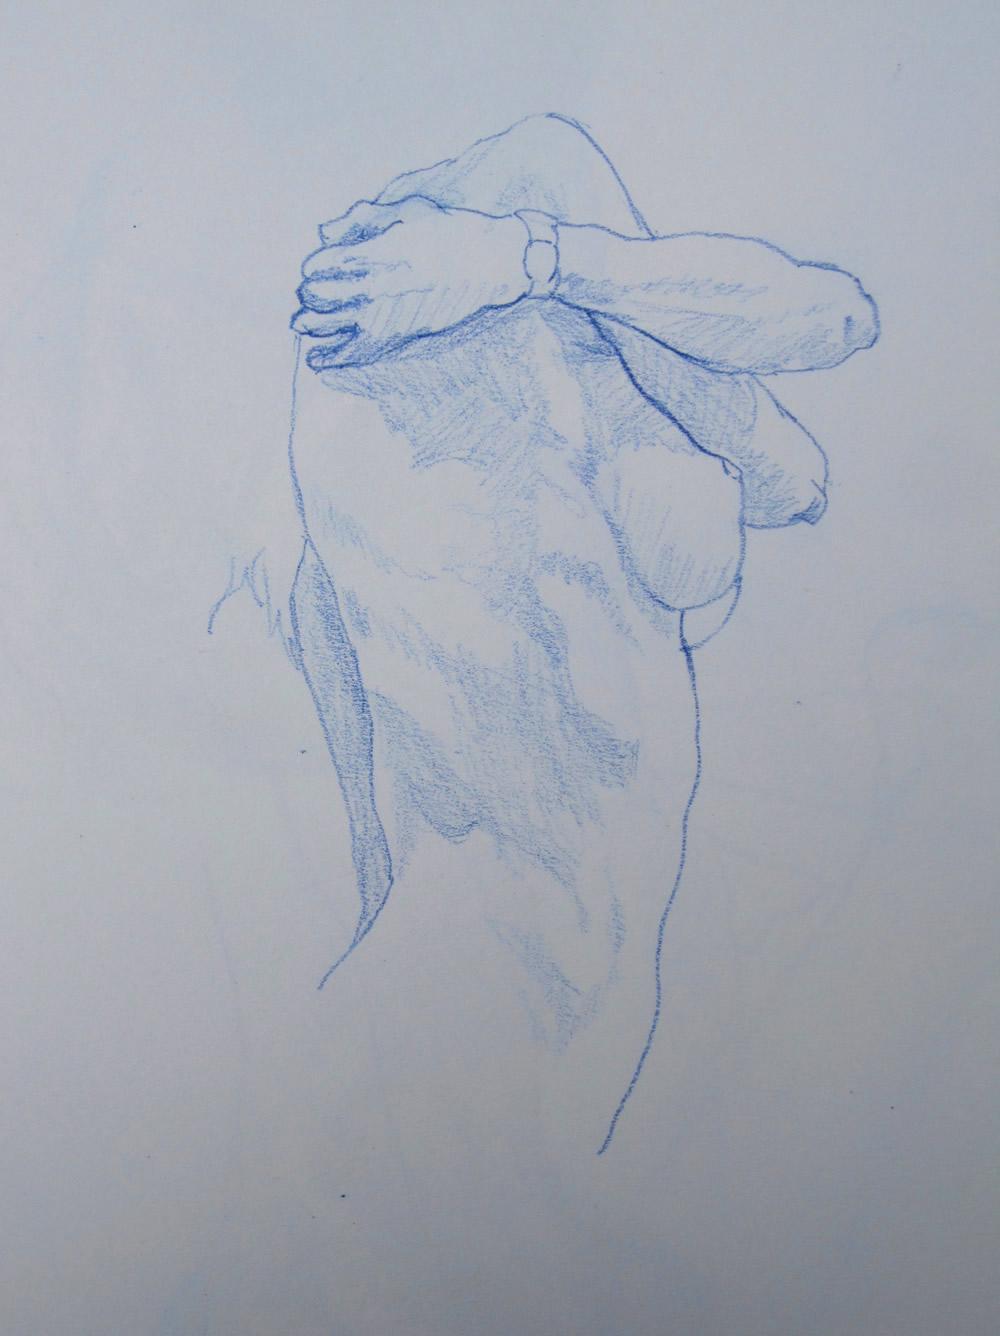 Chrissy Thirlaway, Life 15 series 6, Pencil on paper, 25x32cm